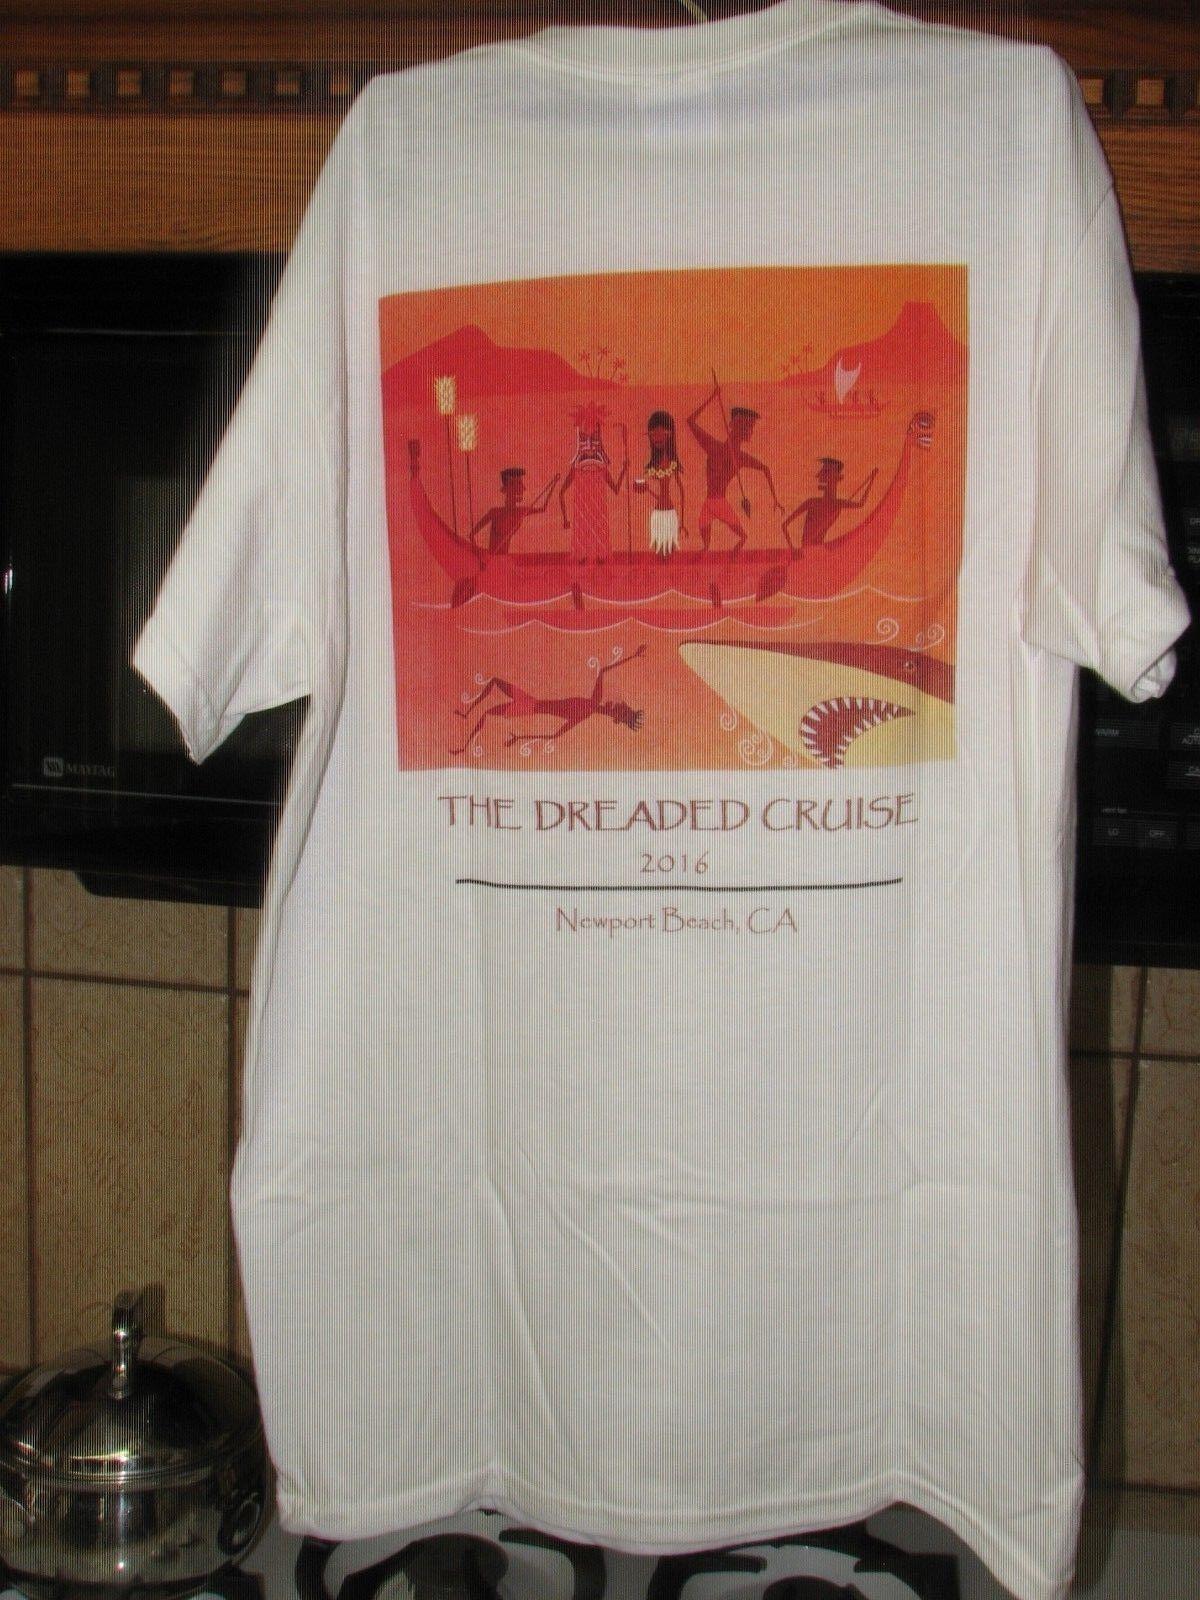 The Dreaded Cruise Tiki cruise Newport Beach t shirt art by Shag New